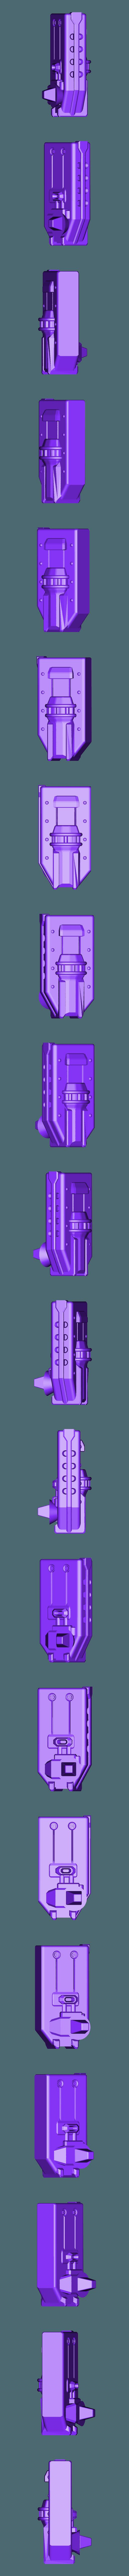 Laser_-_R.stl Download free STL file EC-099 Assault Bot - 28-32mm gaming • 3D printer template, ec3d